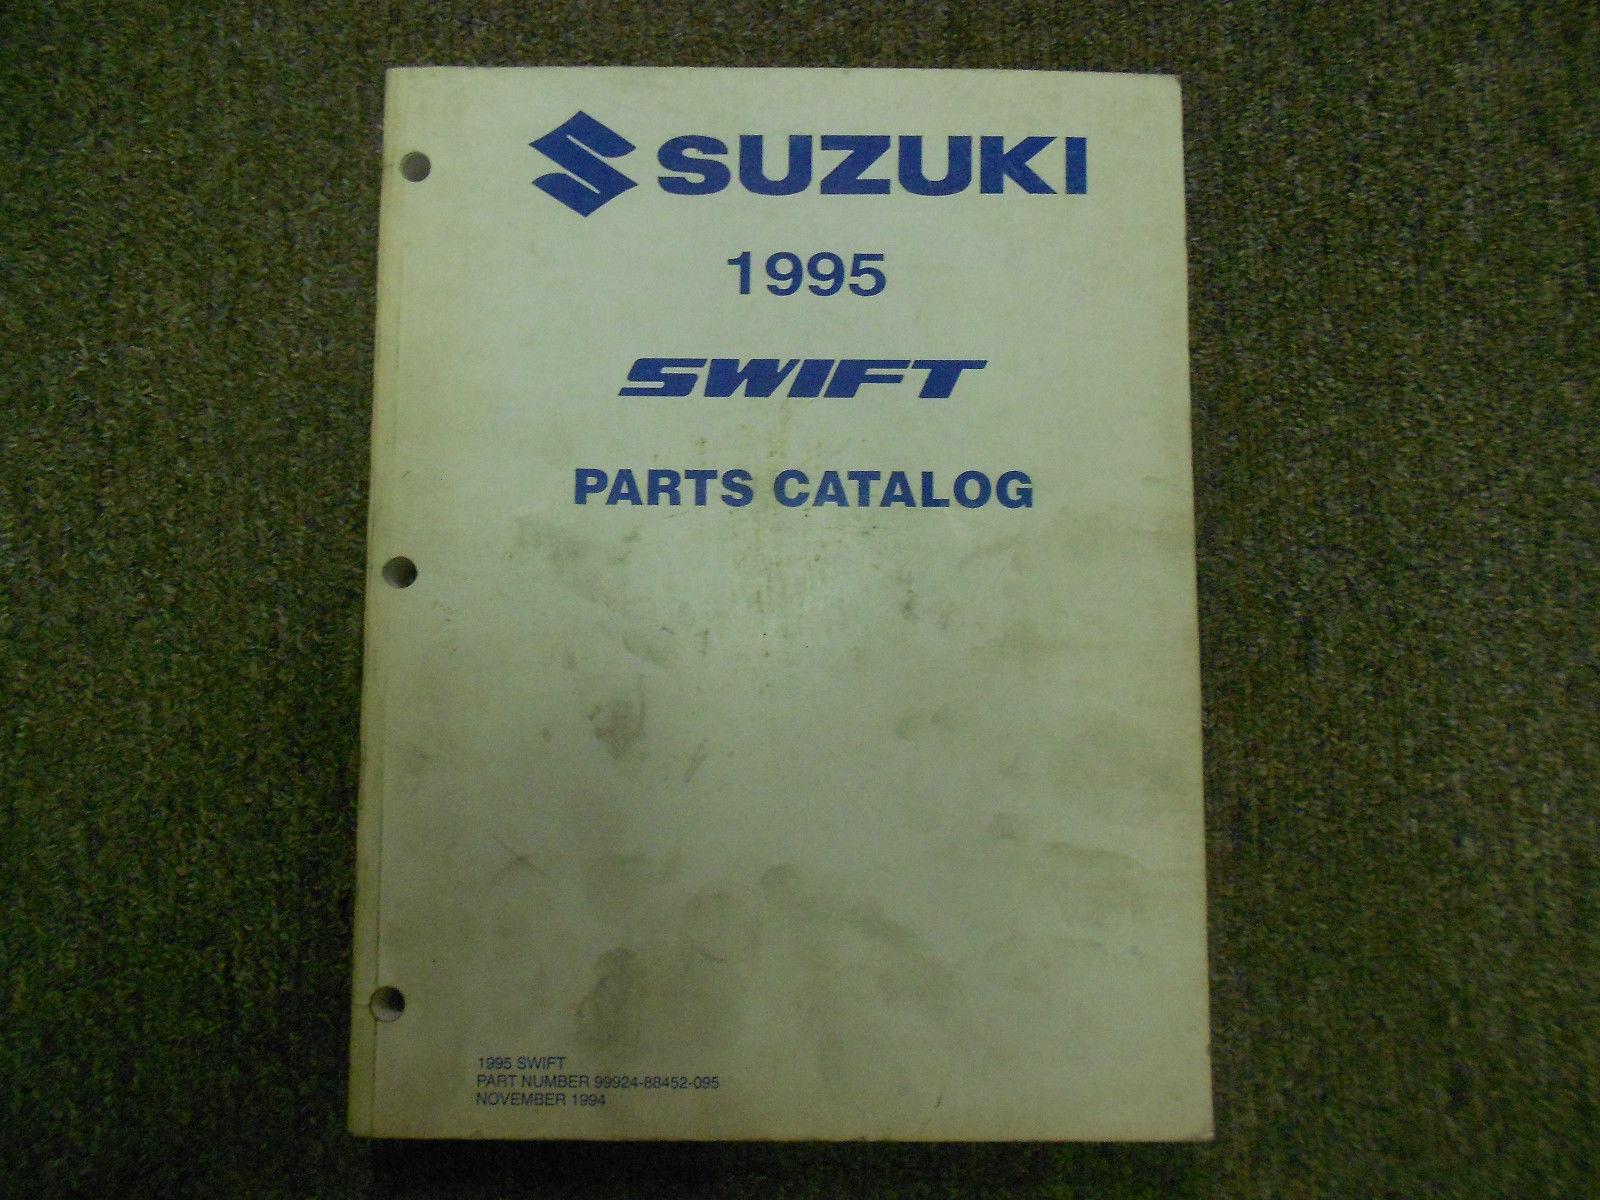 1995 Suzuki Swift Parts Catalog Manual and 50 similar items